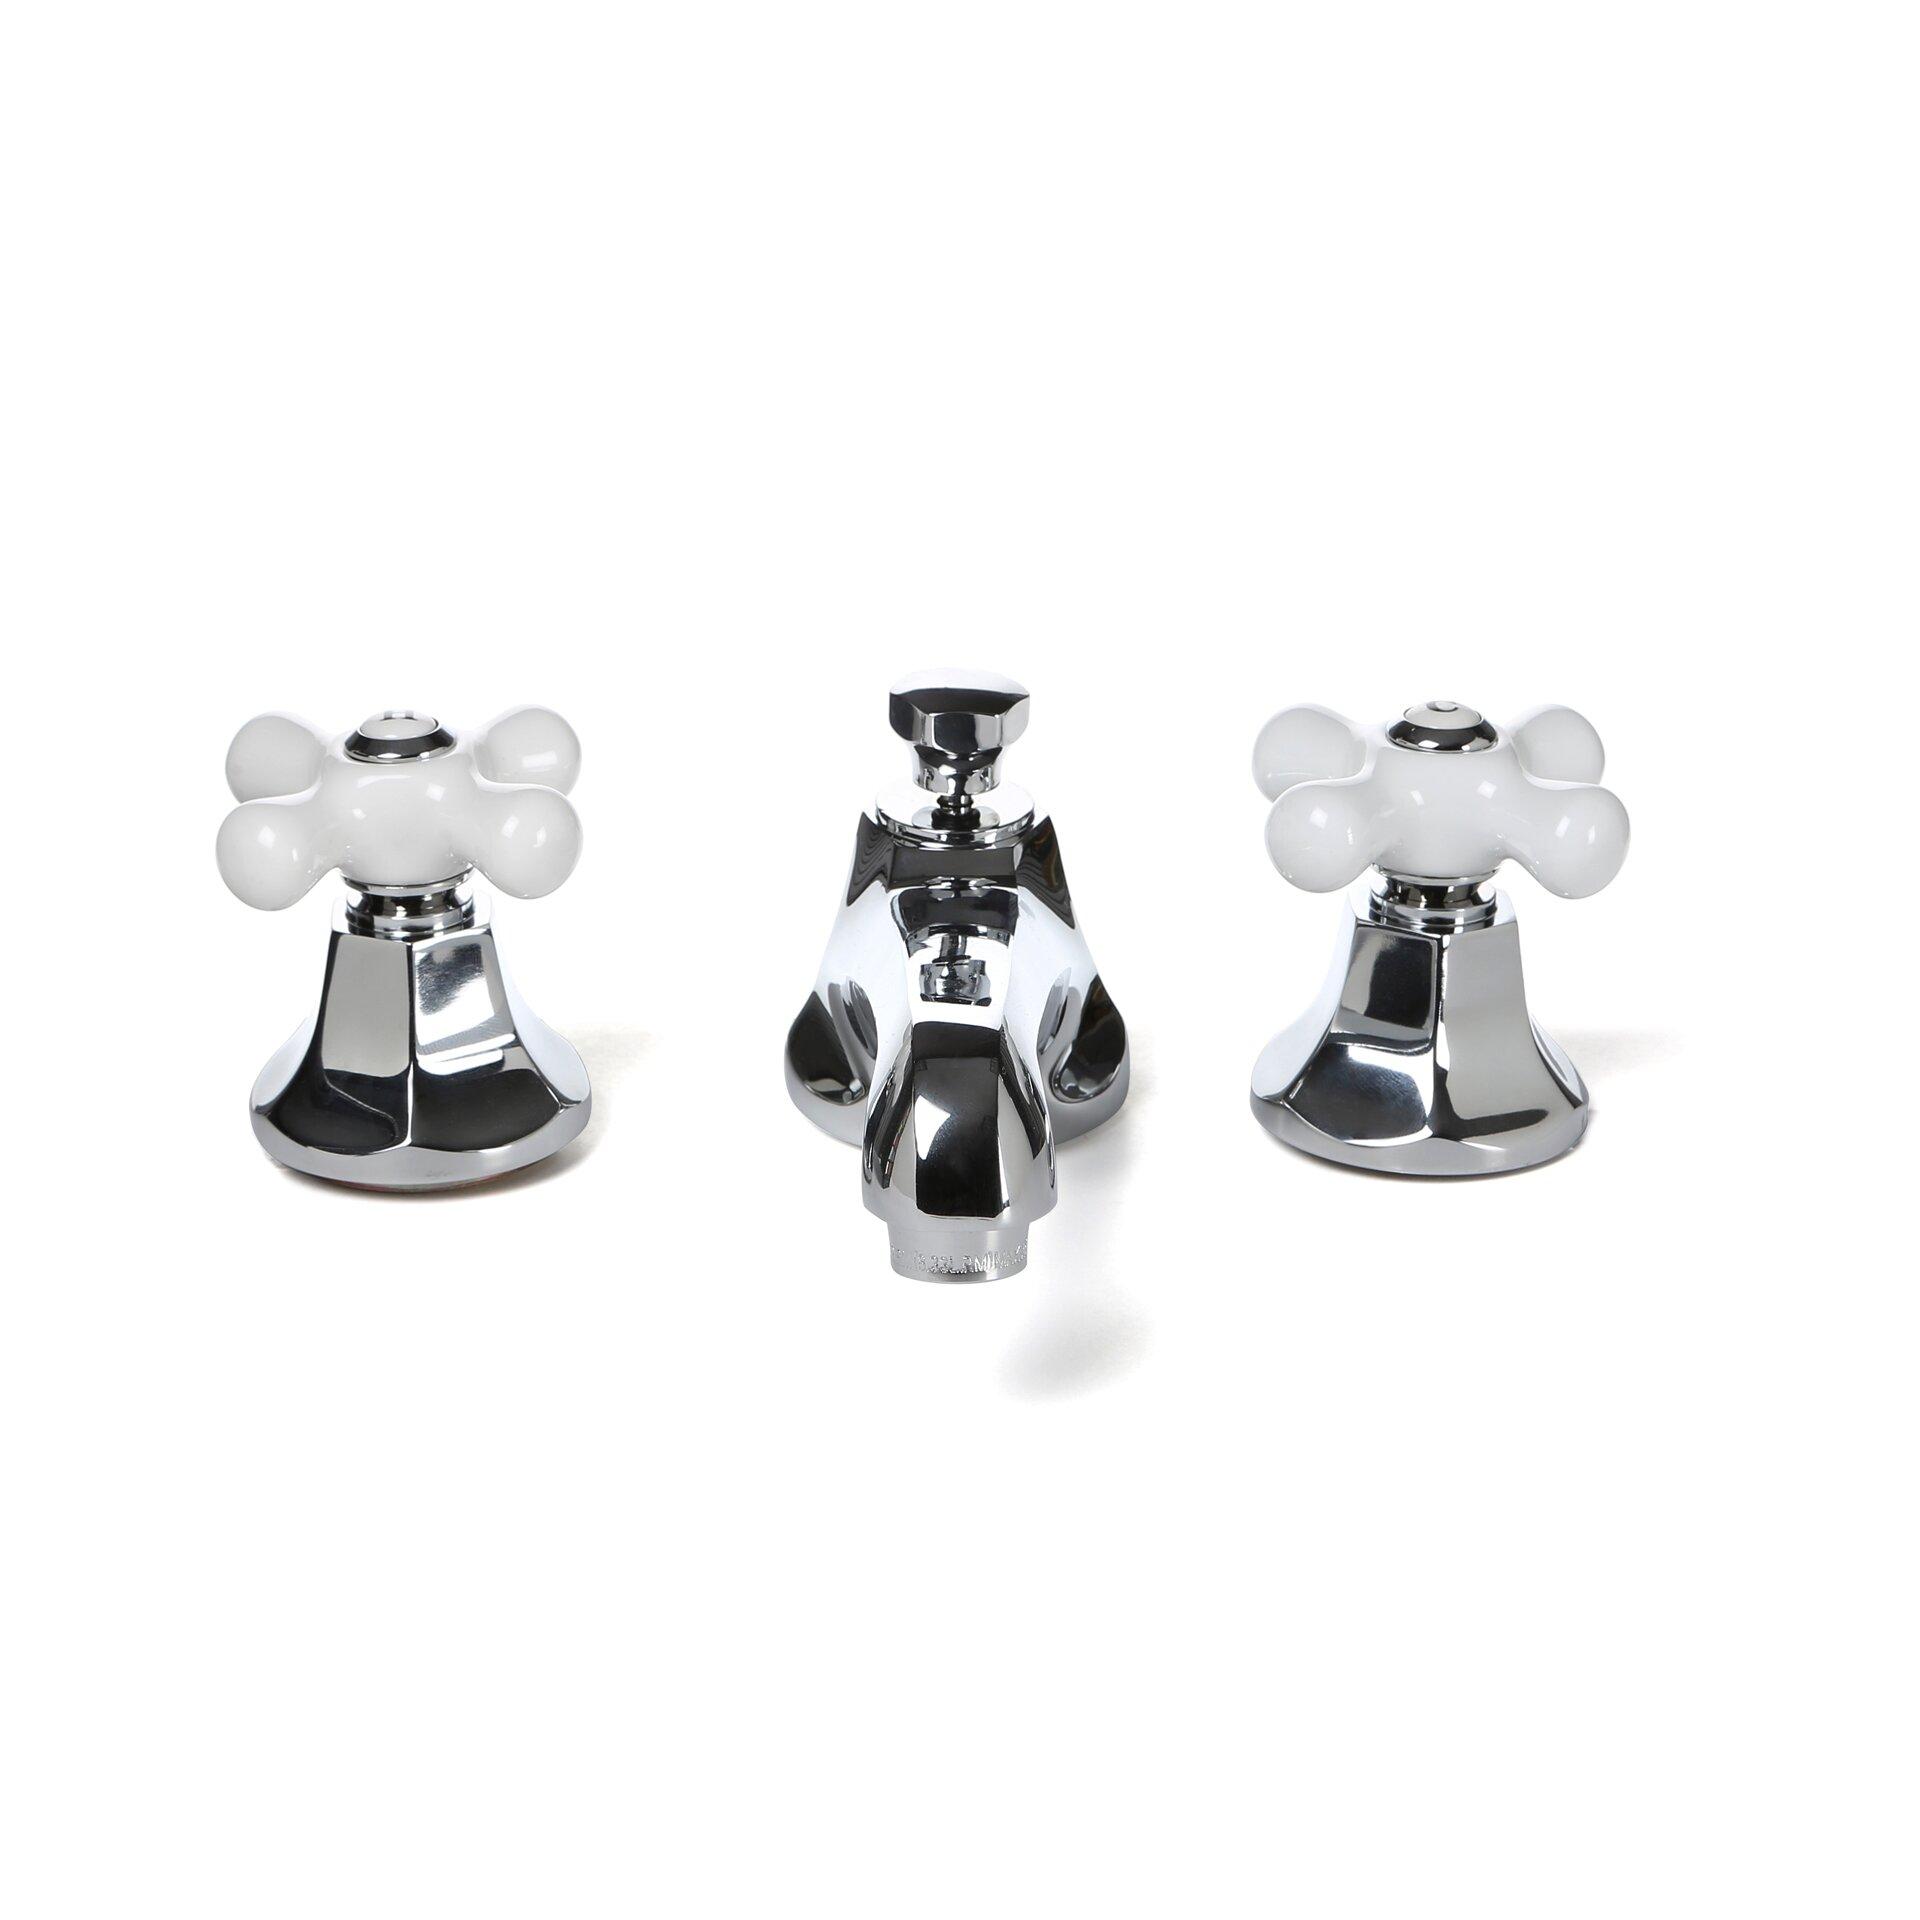 bathroom faucets white porcelain handles | My Web Value